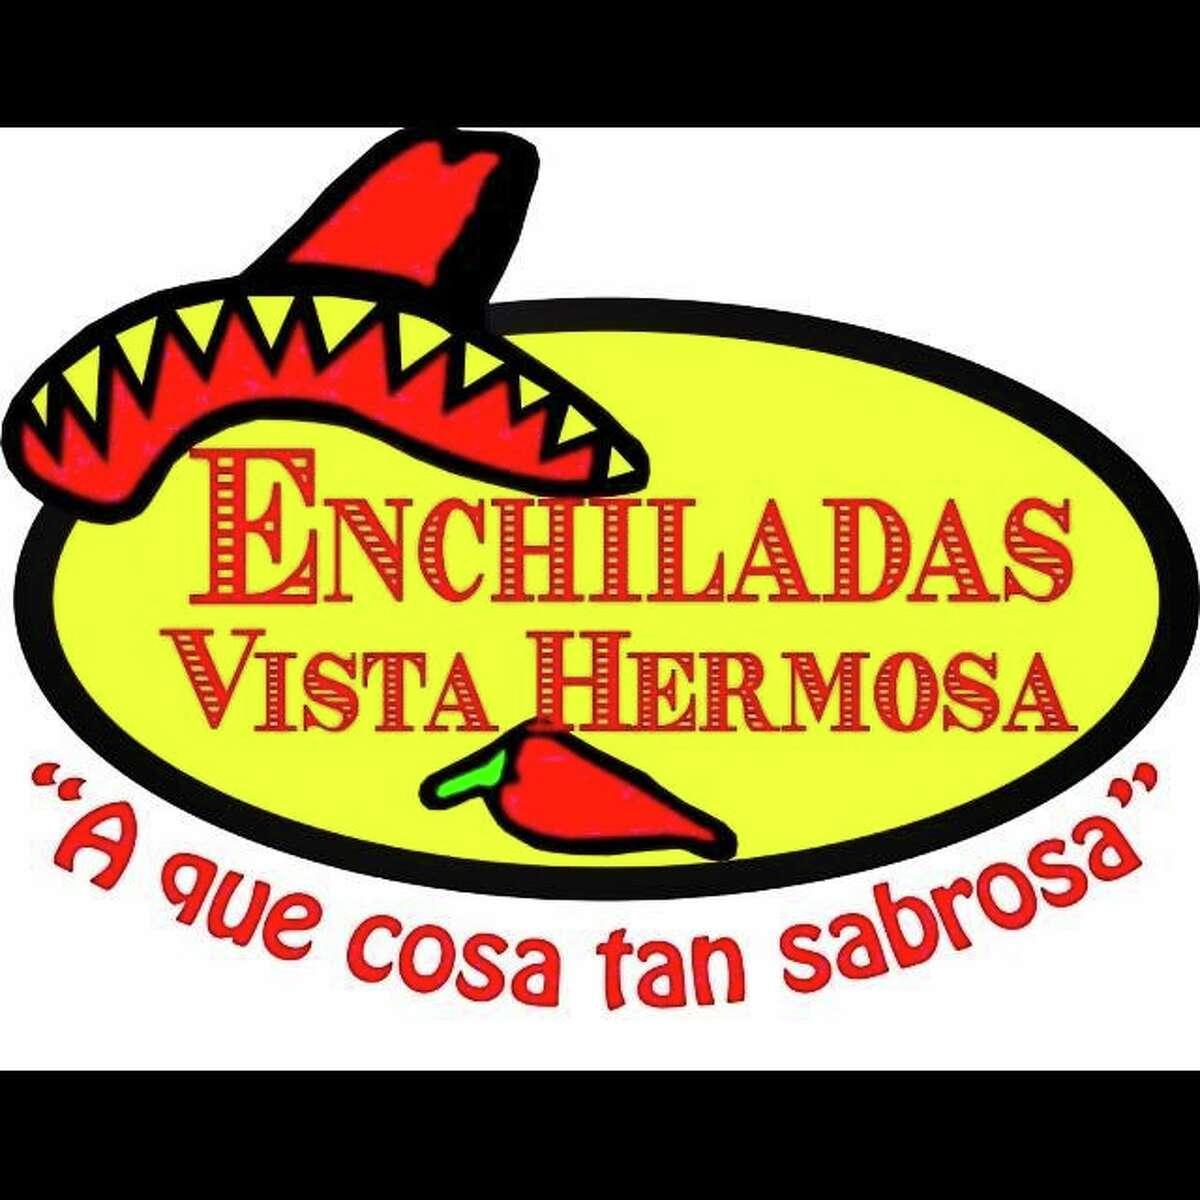 Enchilada Vista Hermosa: 1318 Santa Ursula Date: 1/19/18 Score: 86Out of compliance: Proper/adequate handwashing, handwashing facilities adequate and accessible